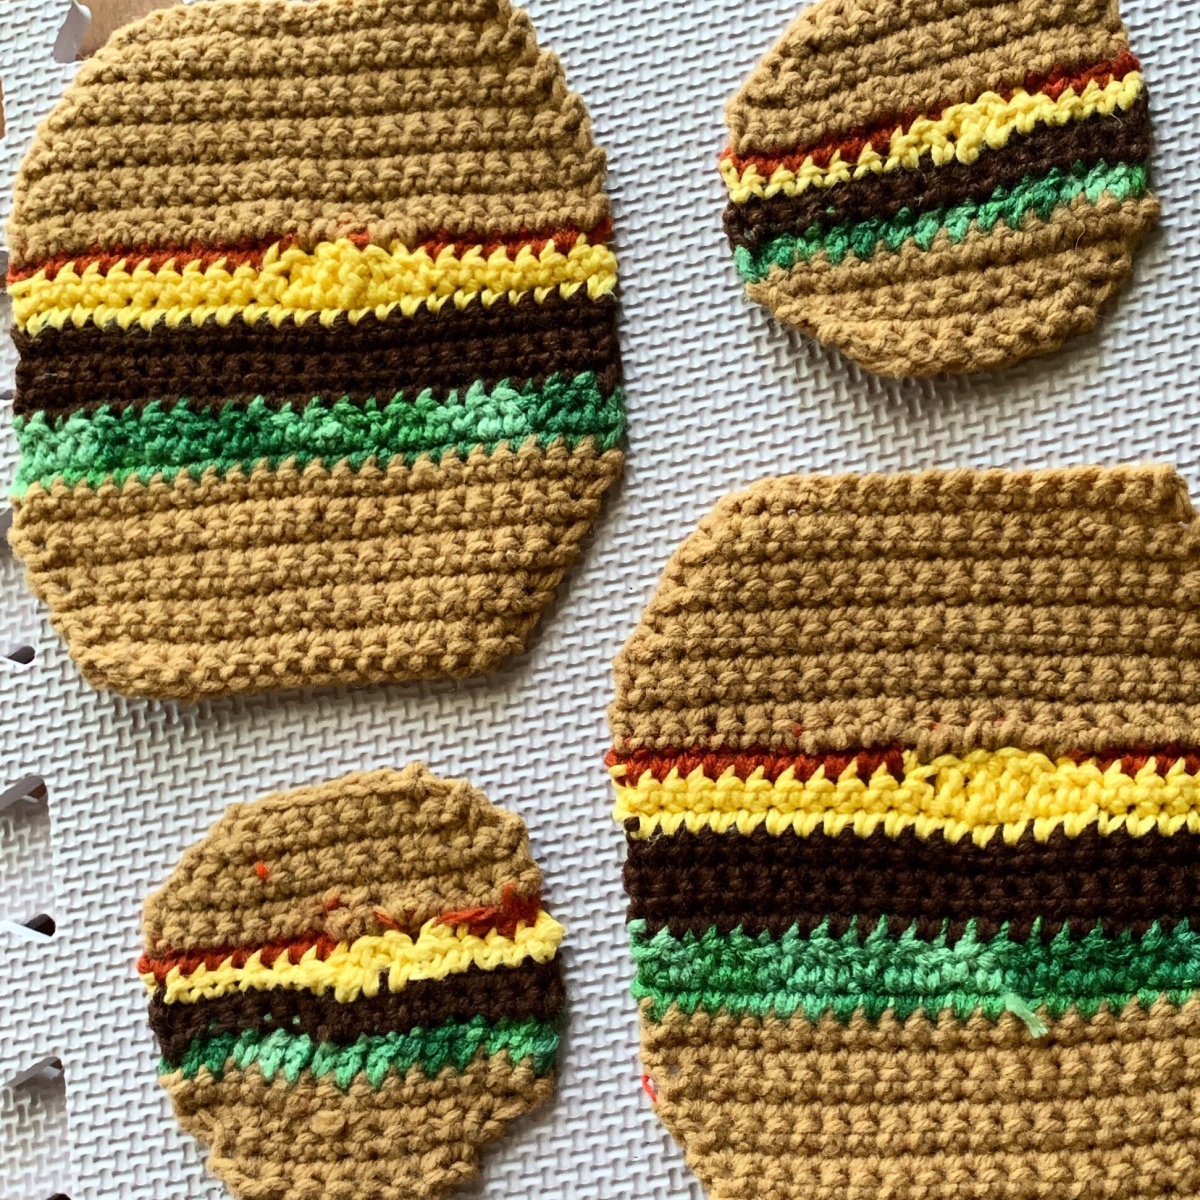 Crochet Project: Cheeseburgers